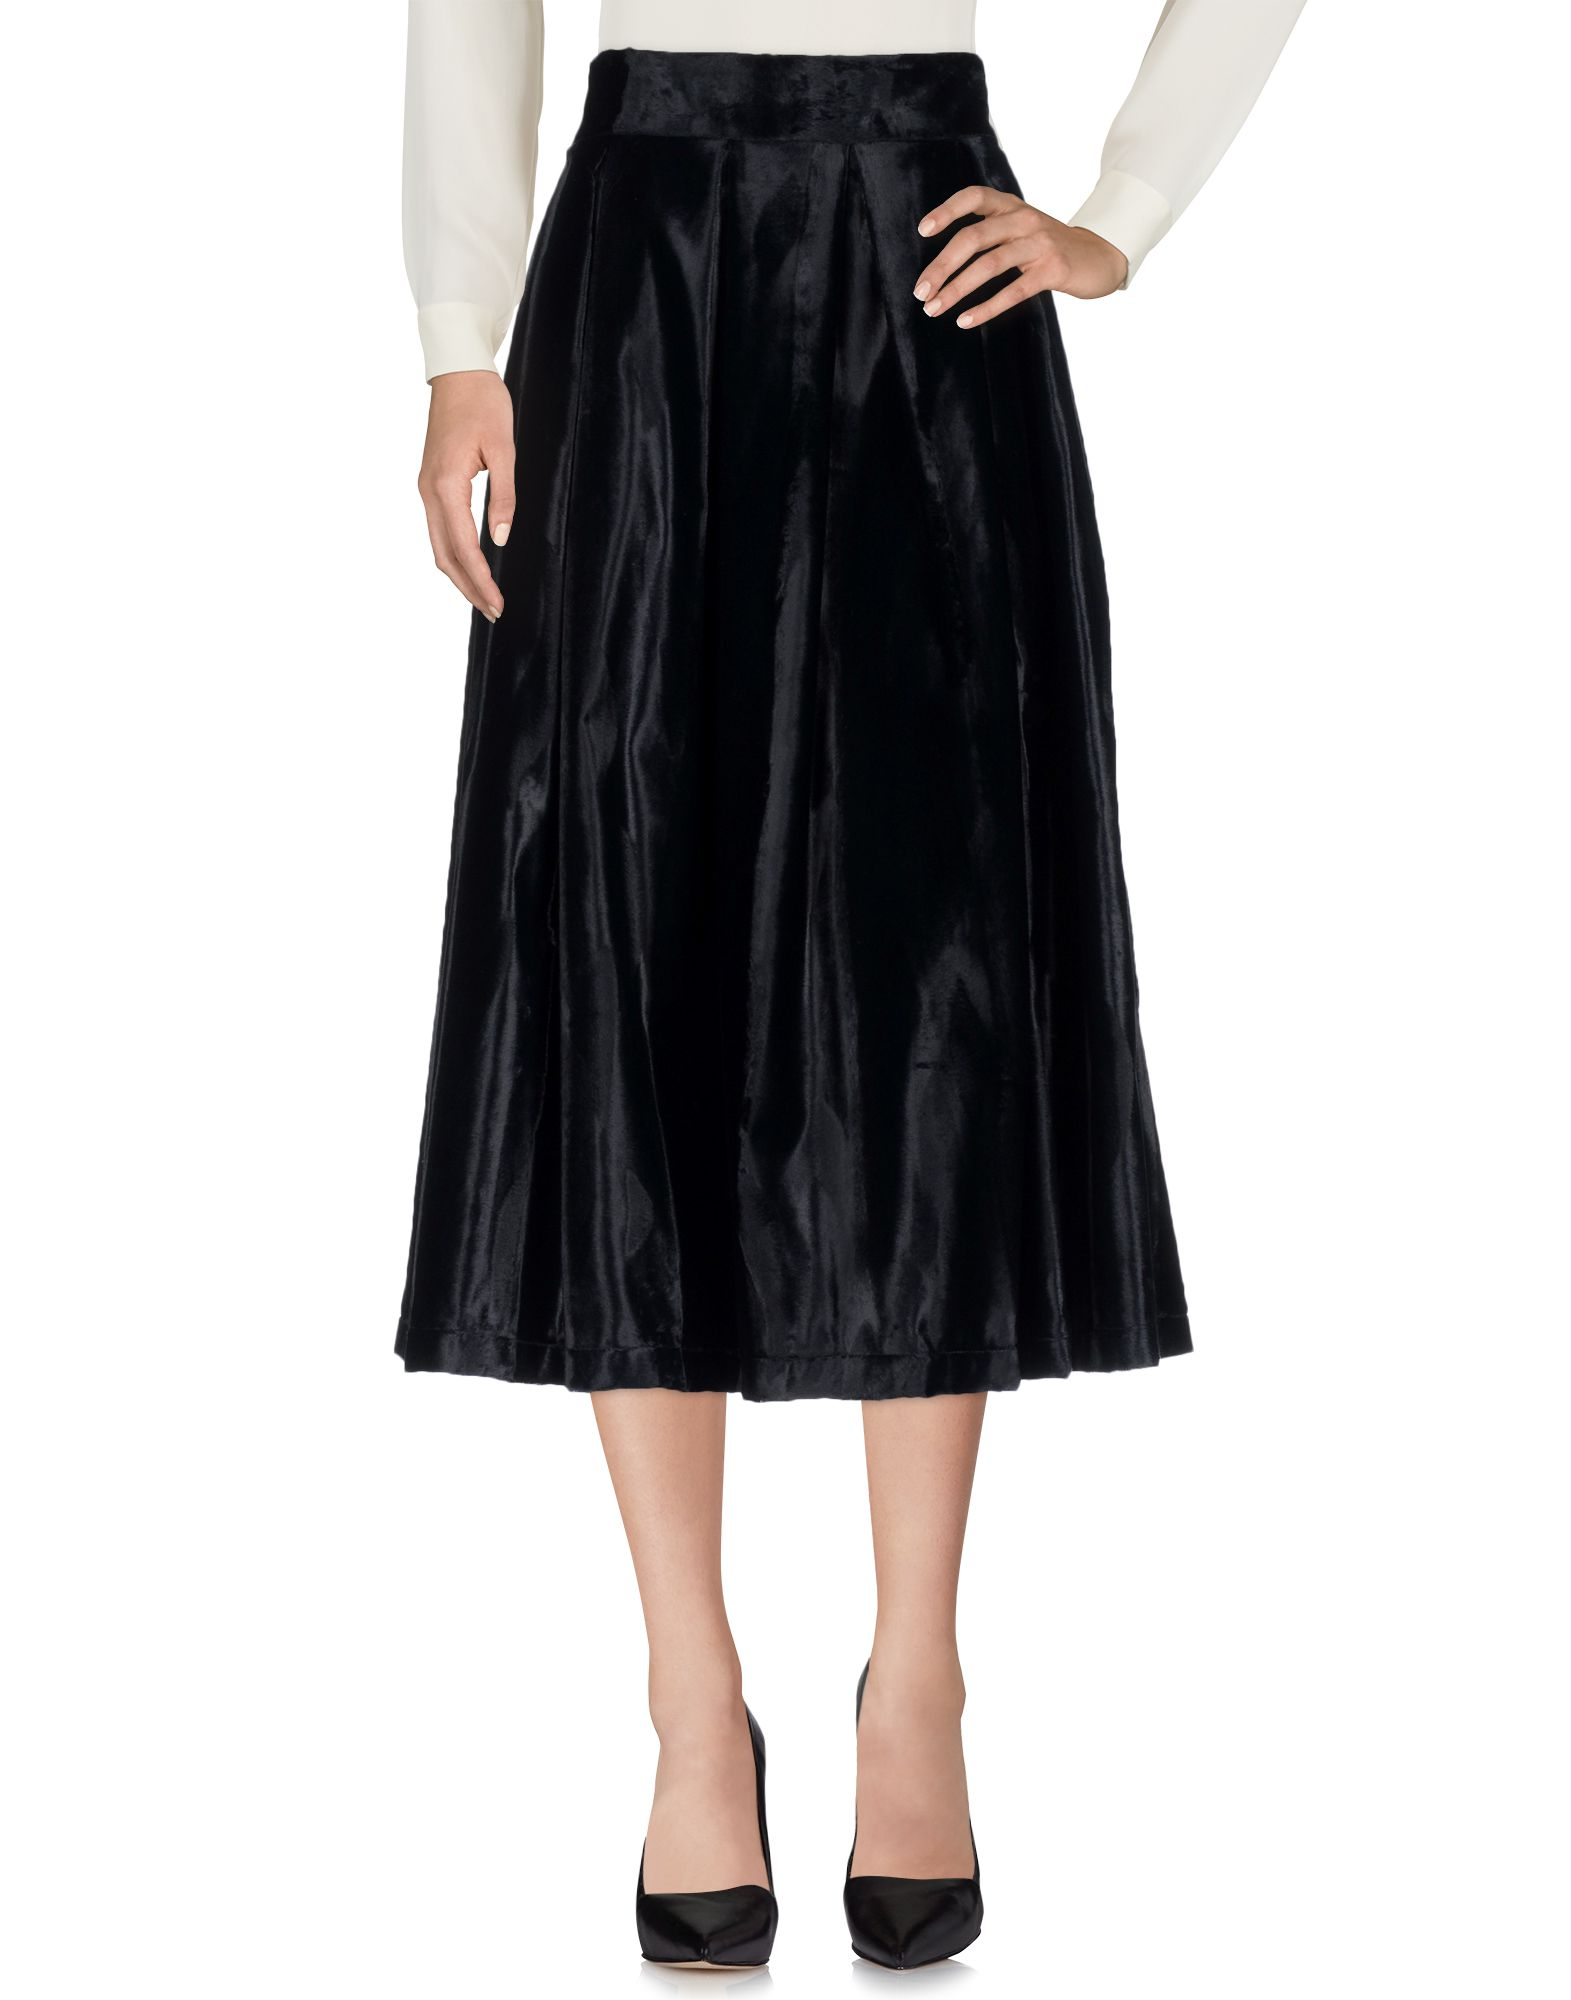 Department 5 Midi Skirts